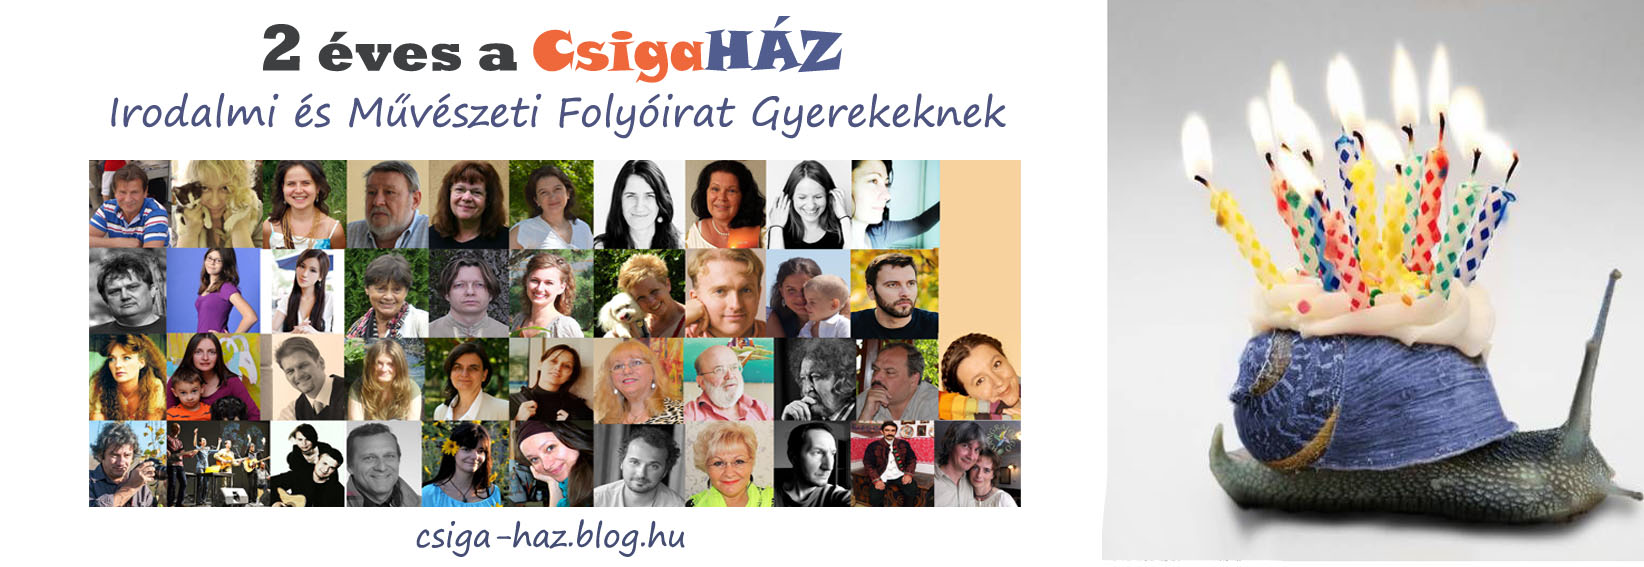 2_eves_a_csigahaz_konyvjelzo_copy.jpg